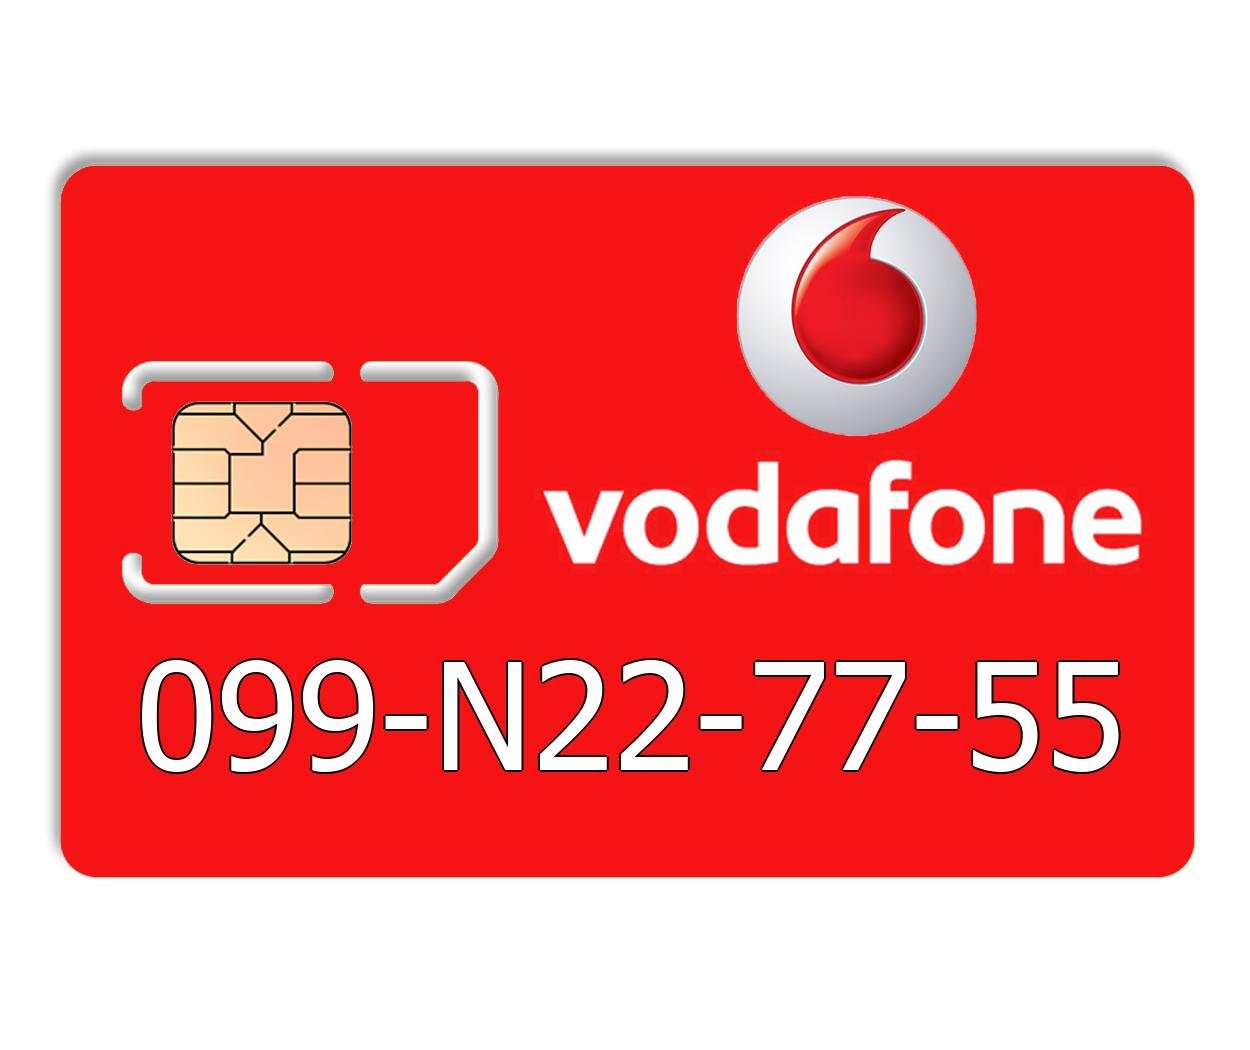 Красивый номер Vodafone 099-N22-77-55